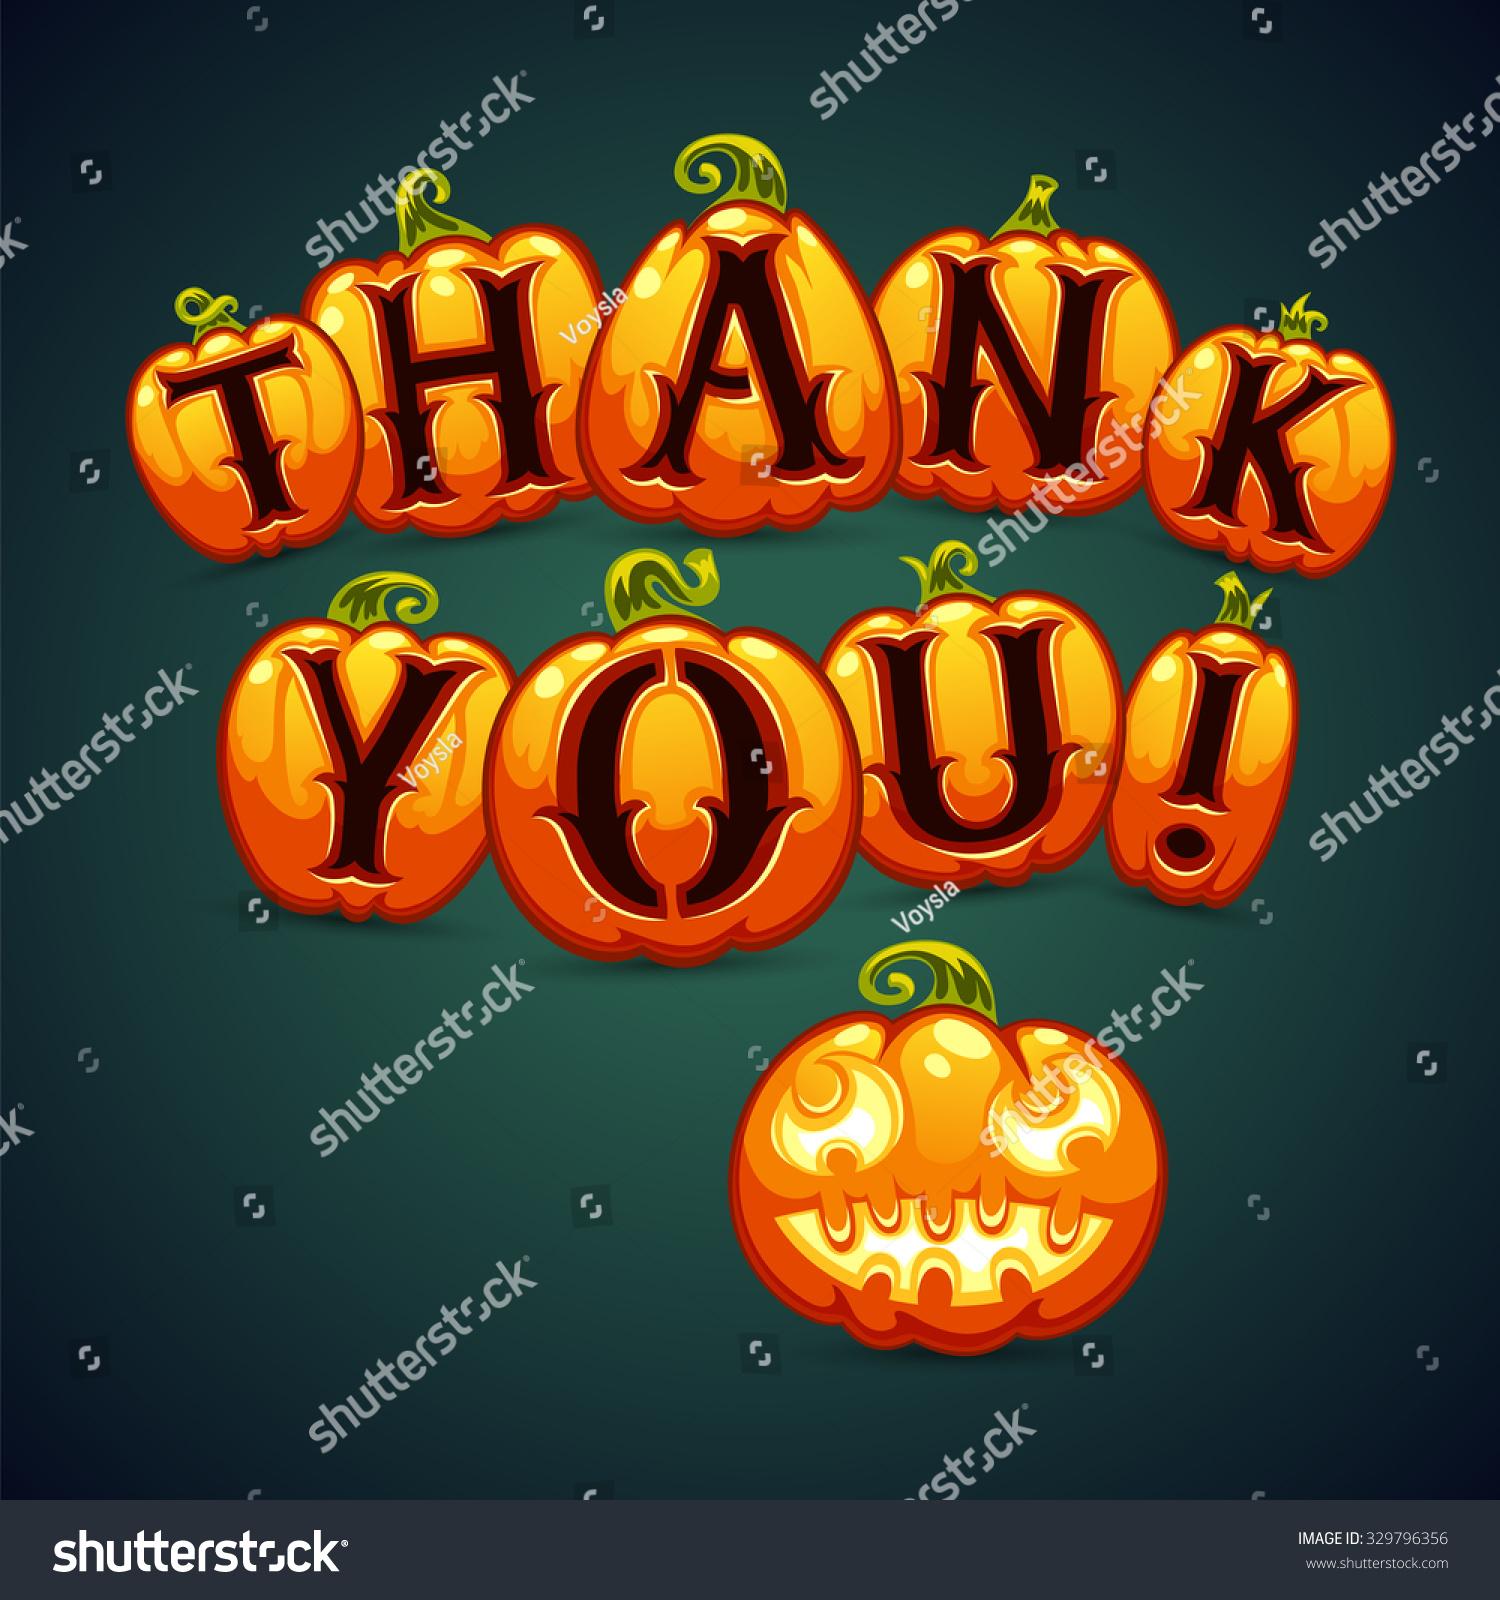 Halloween Pumpkin Says Thank You Greeting Stock Vector 329796356 ...